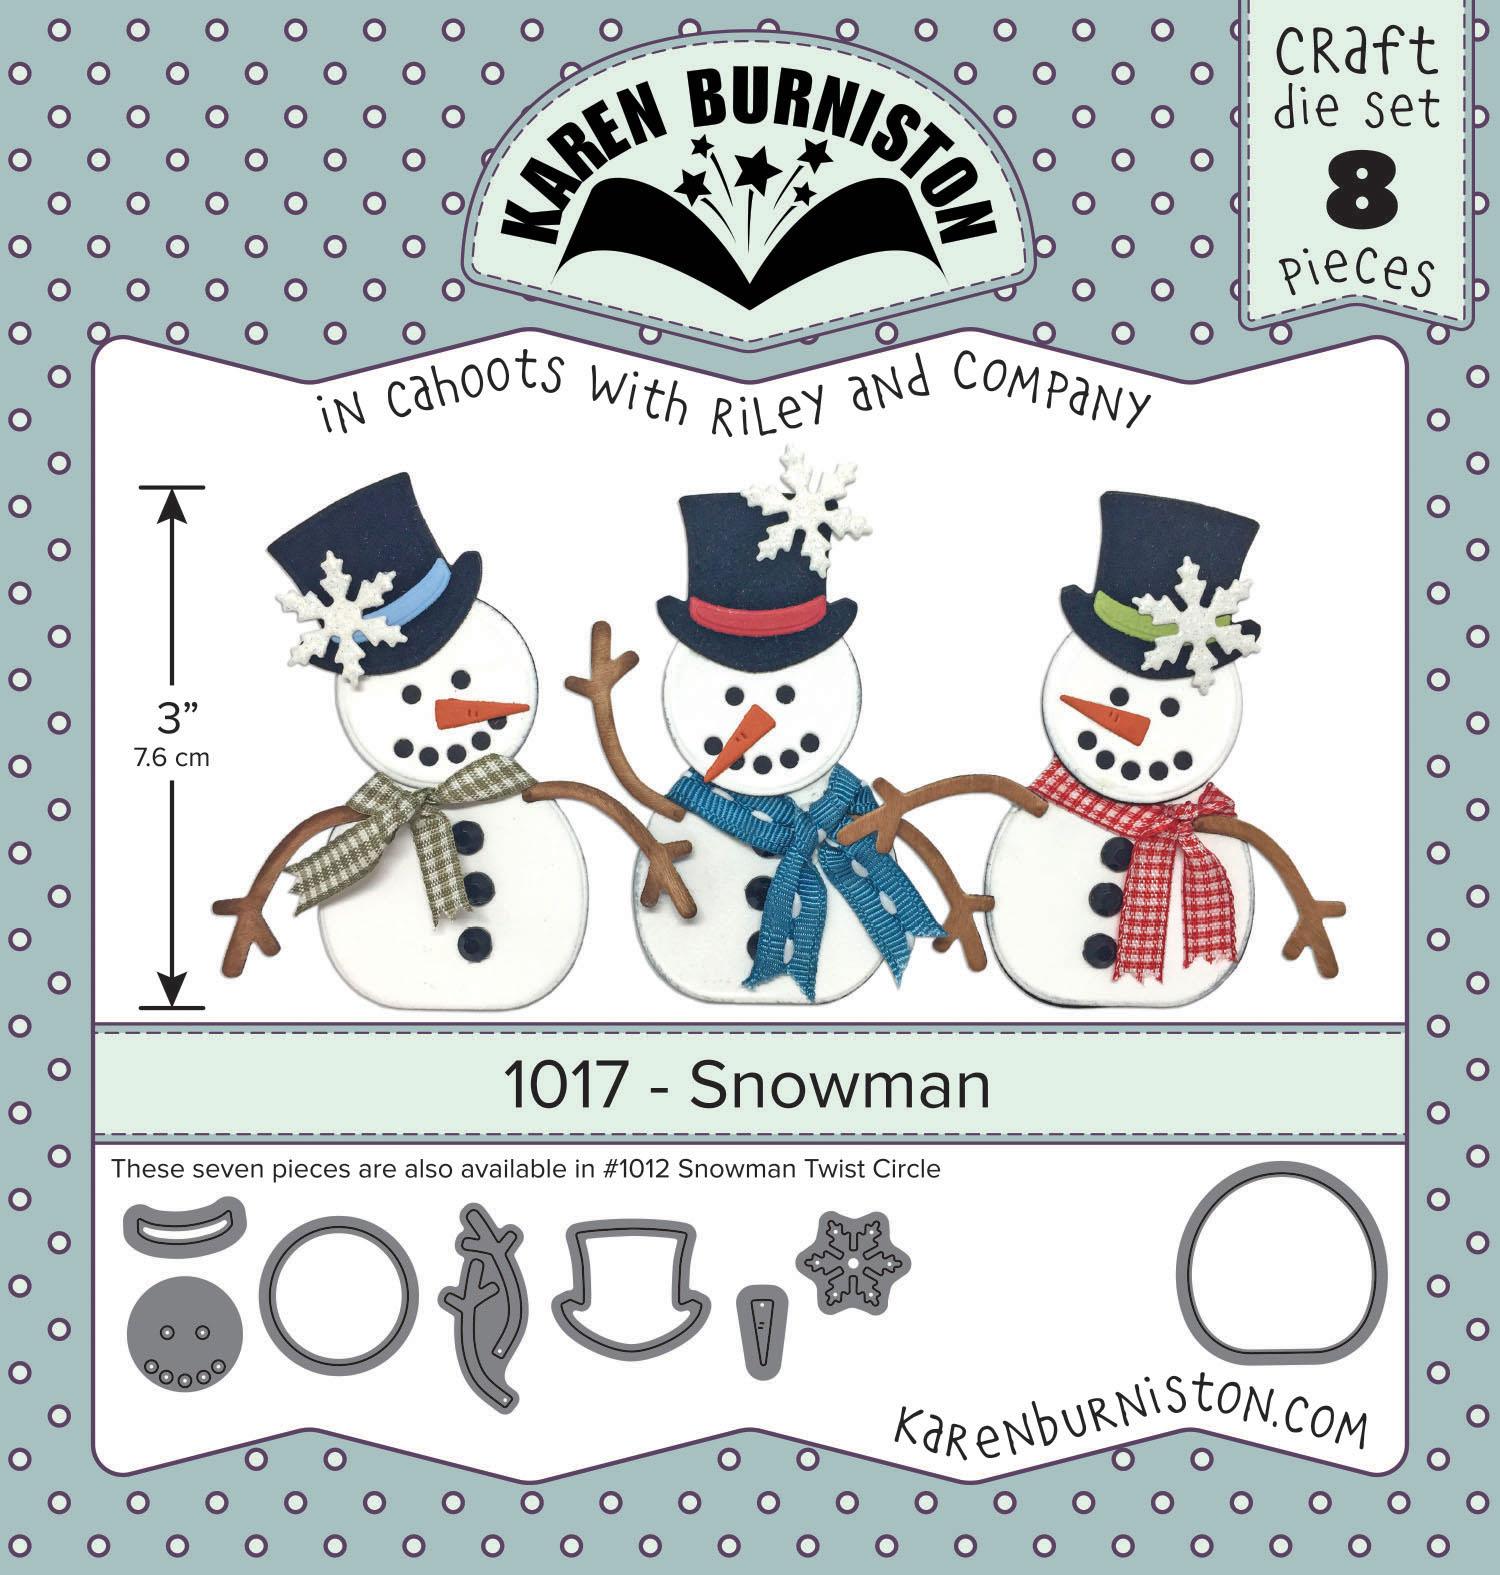 1017-snowman.jpg